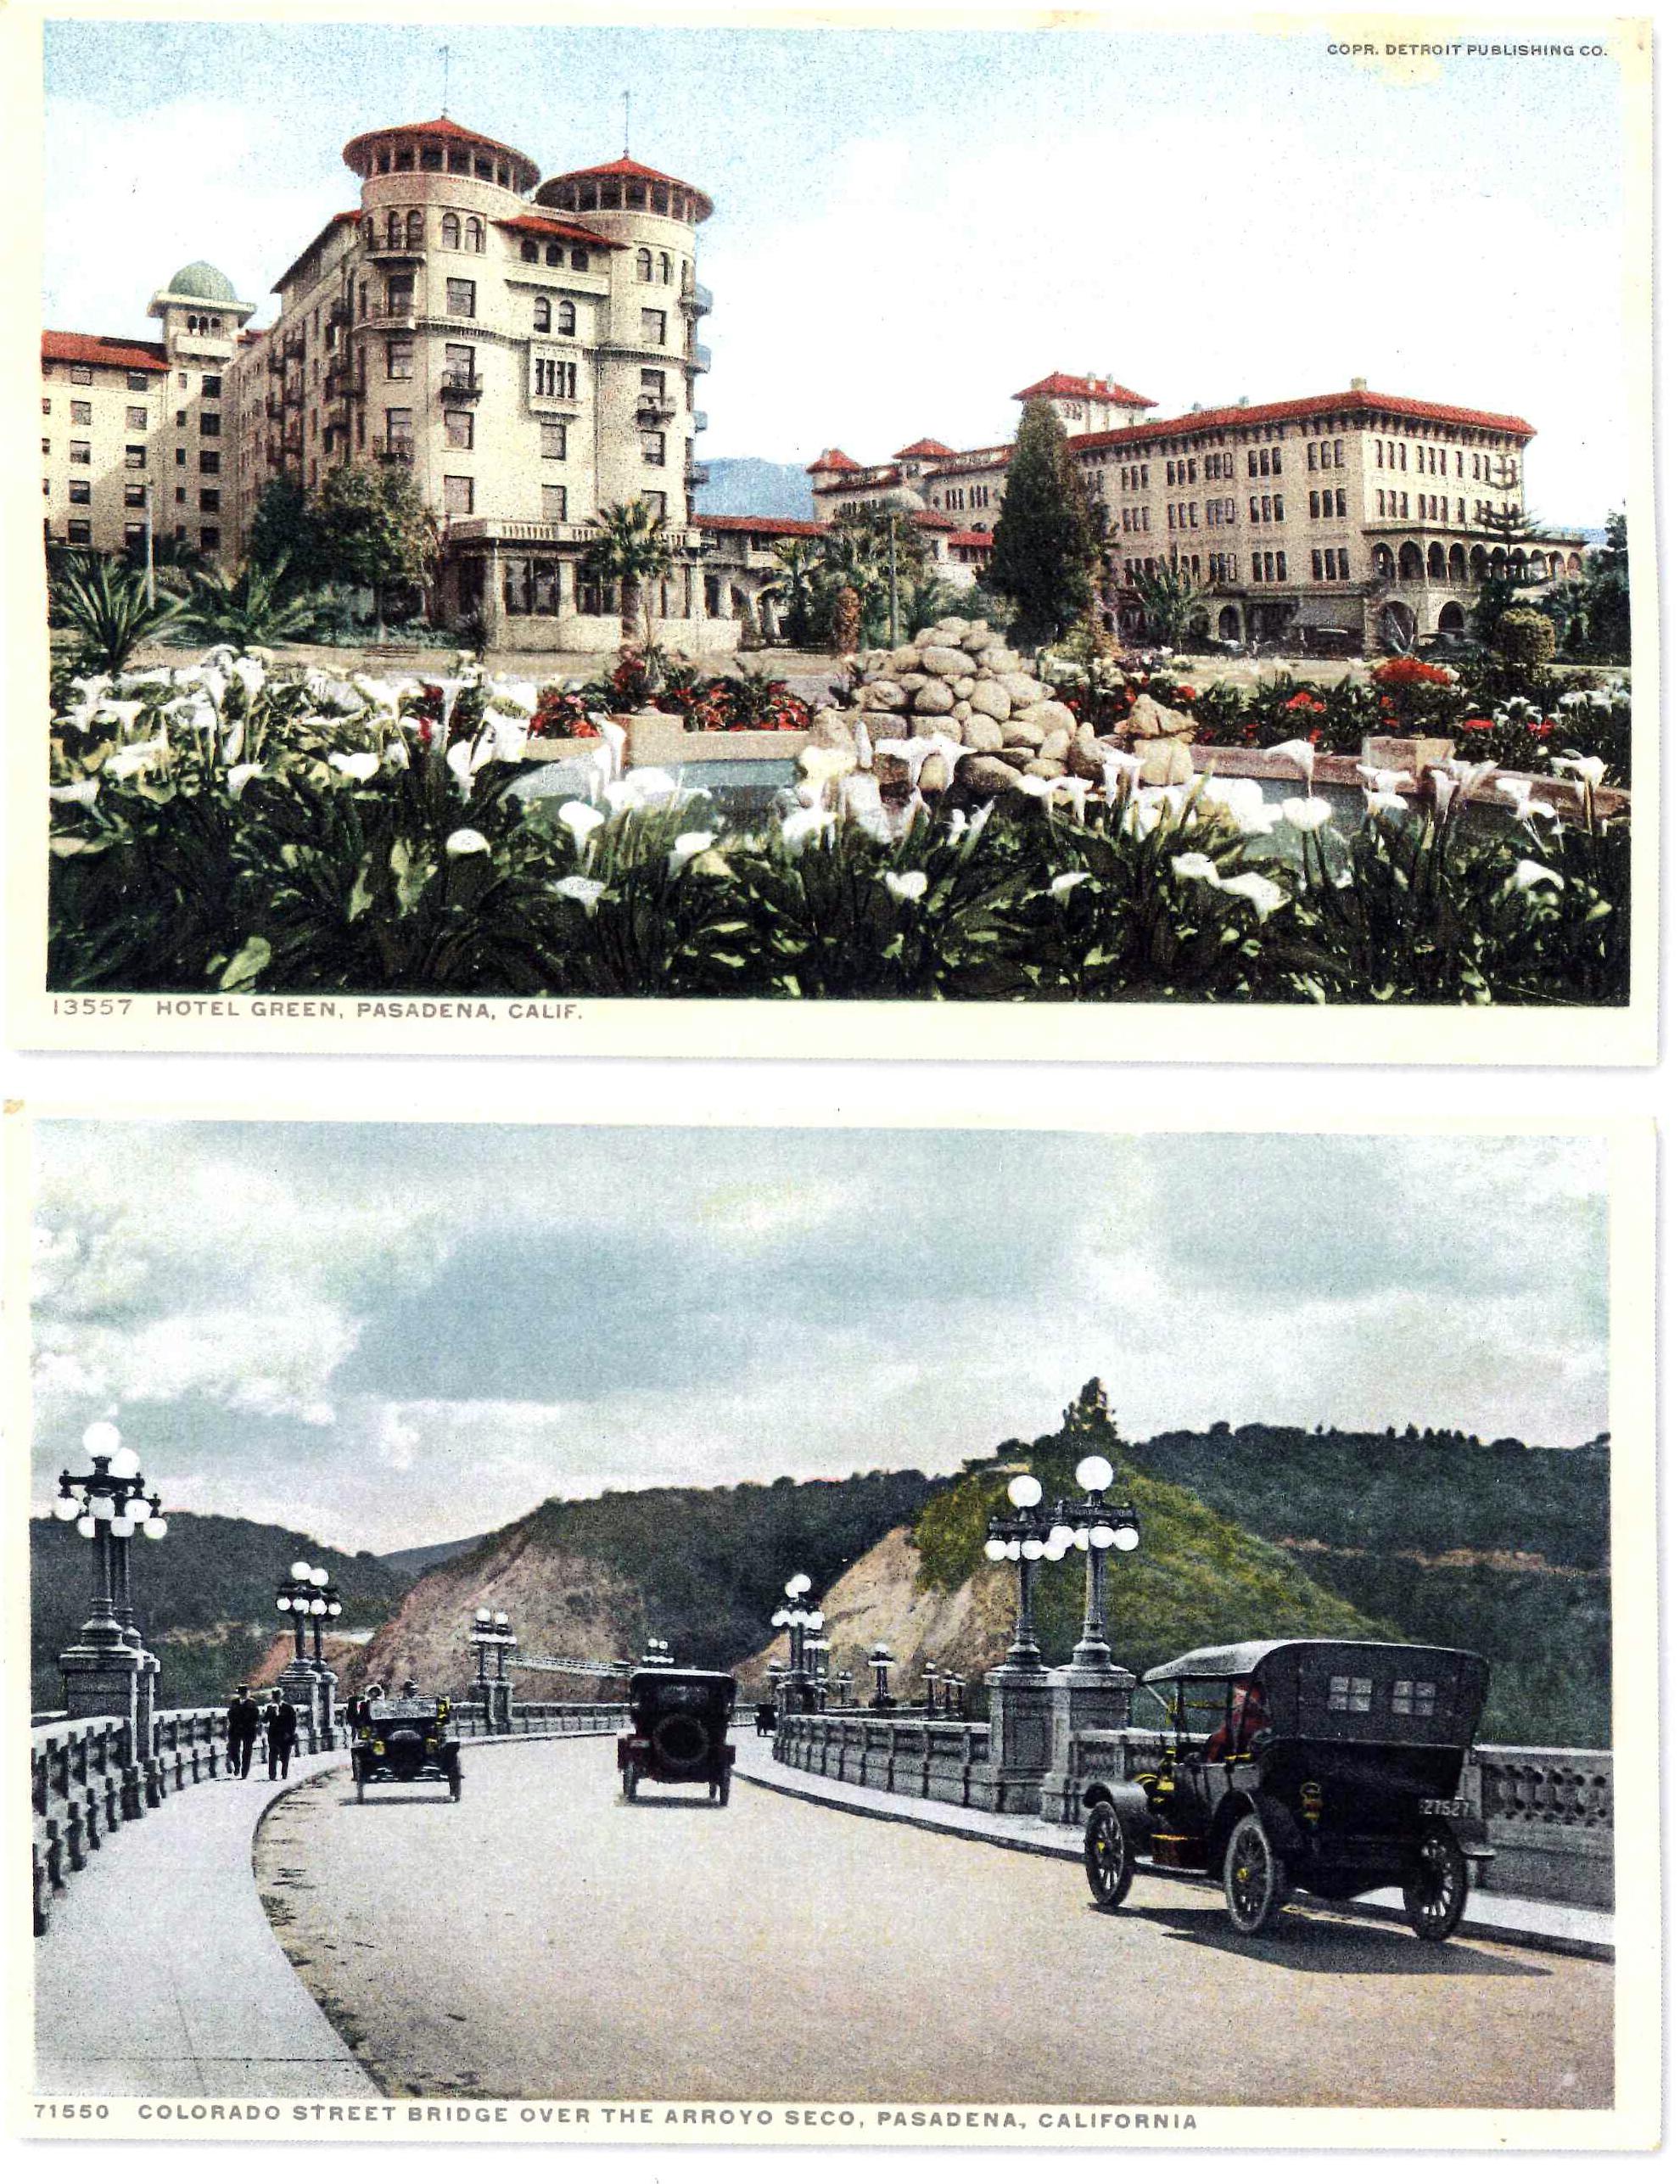 Hotel Green (top) and the Colorado Street Bridge over Arroyo Seco in Pasadena, California